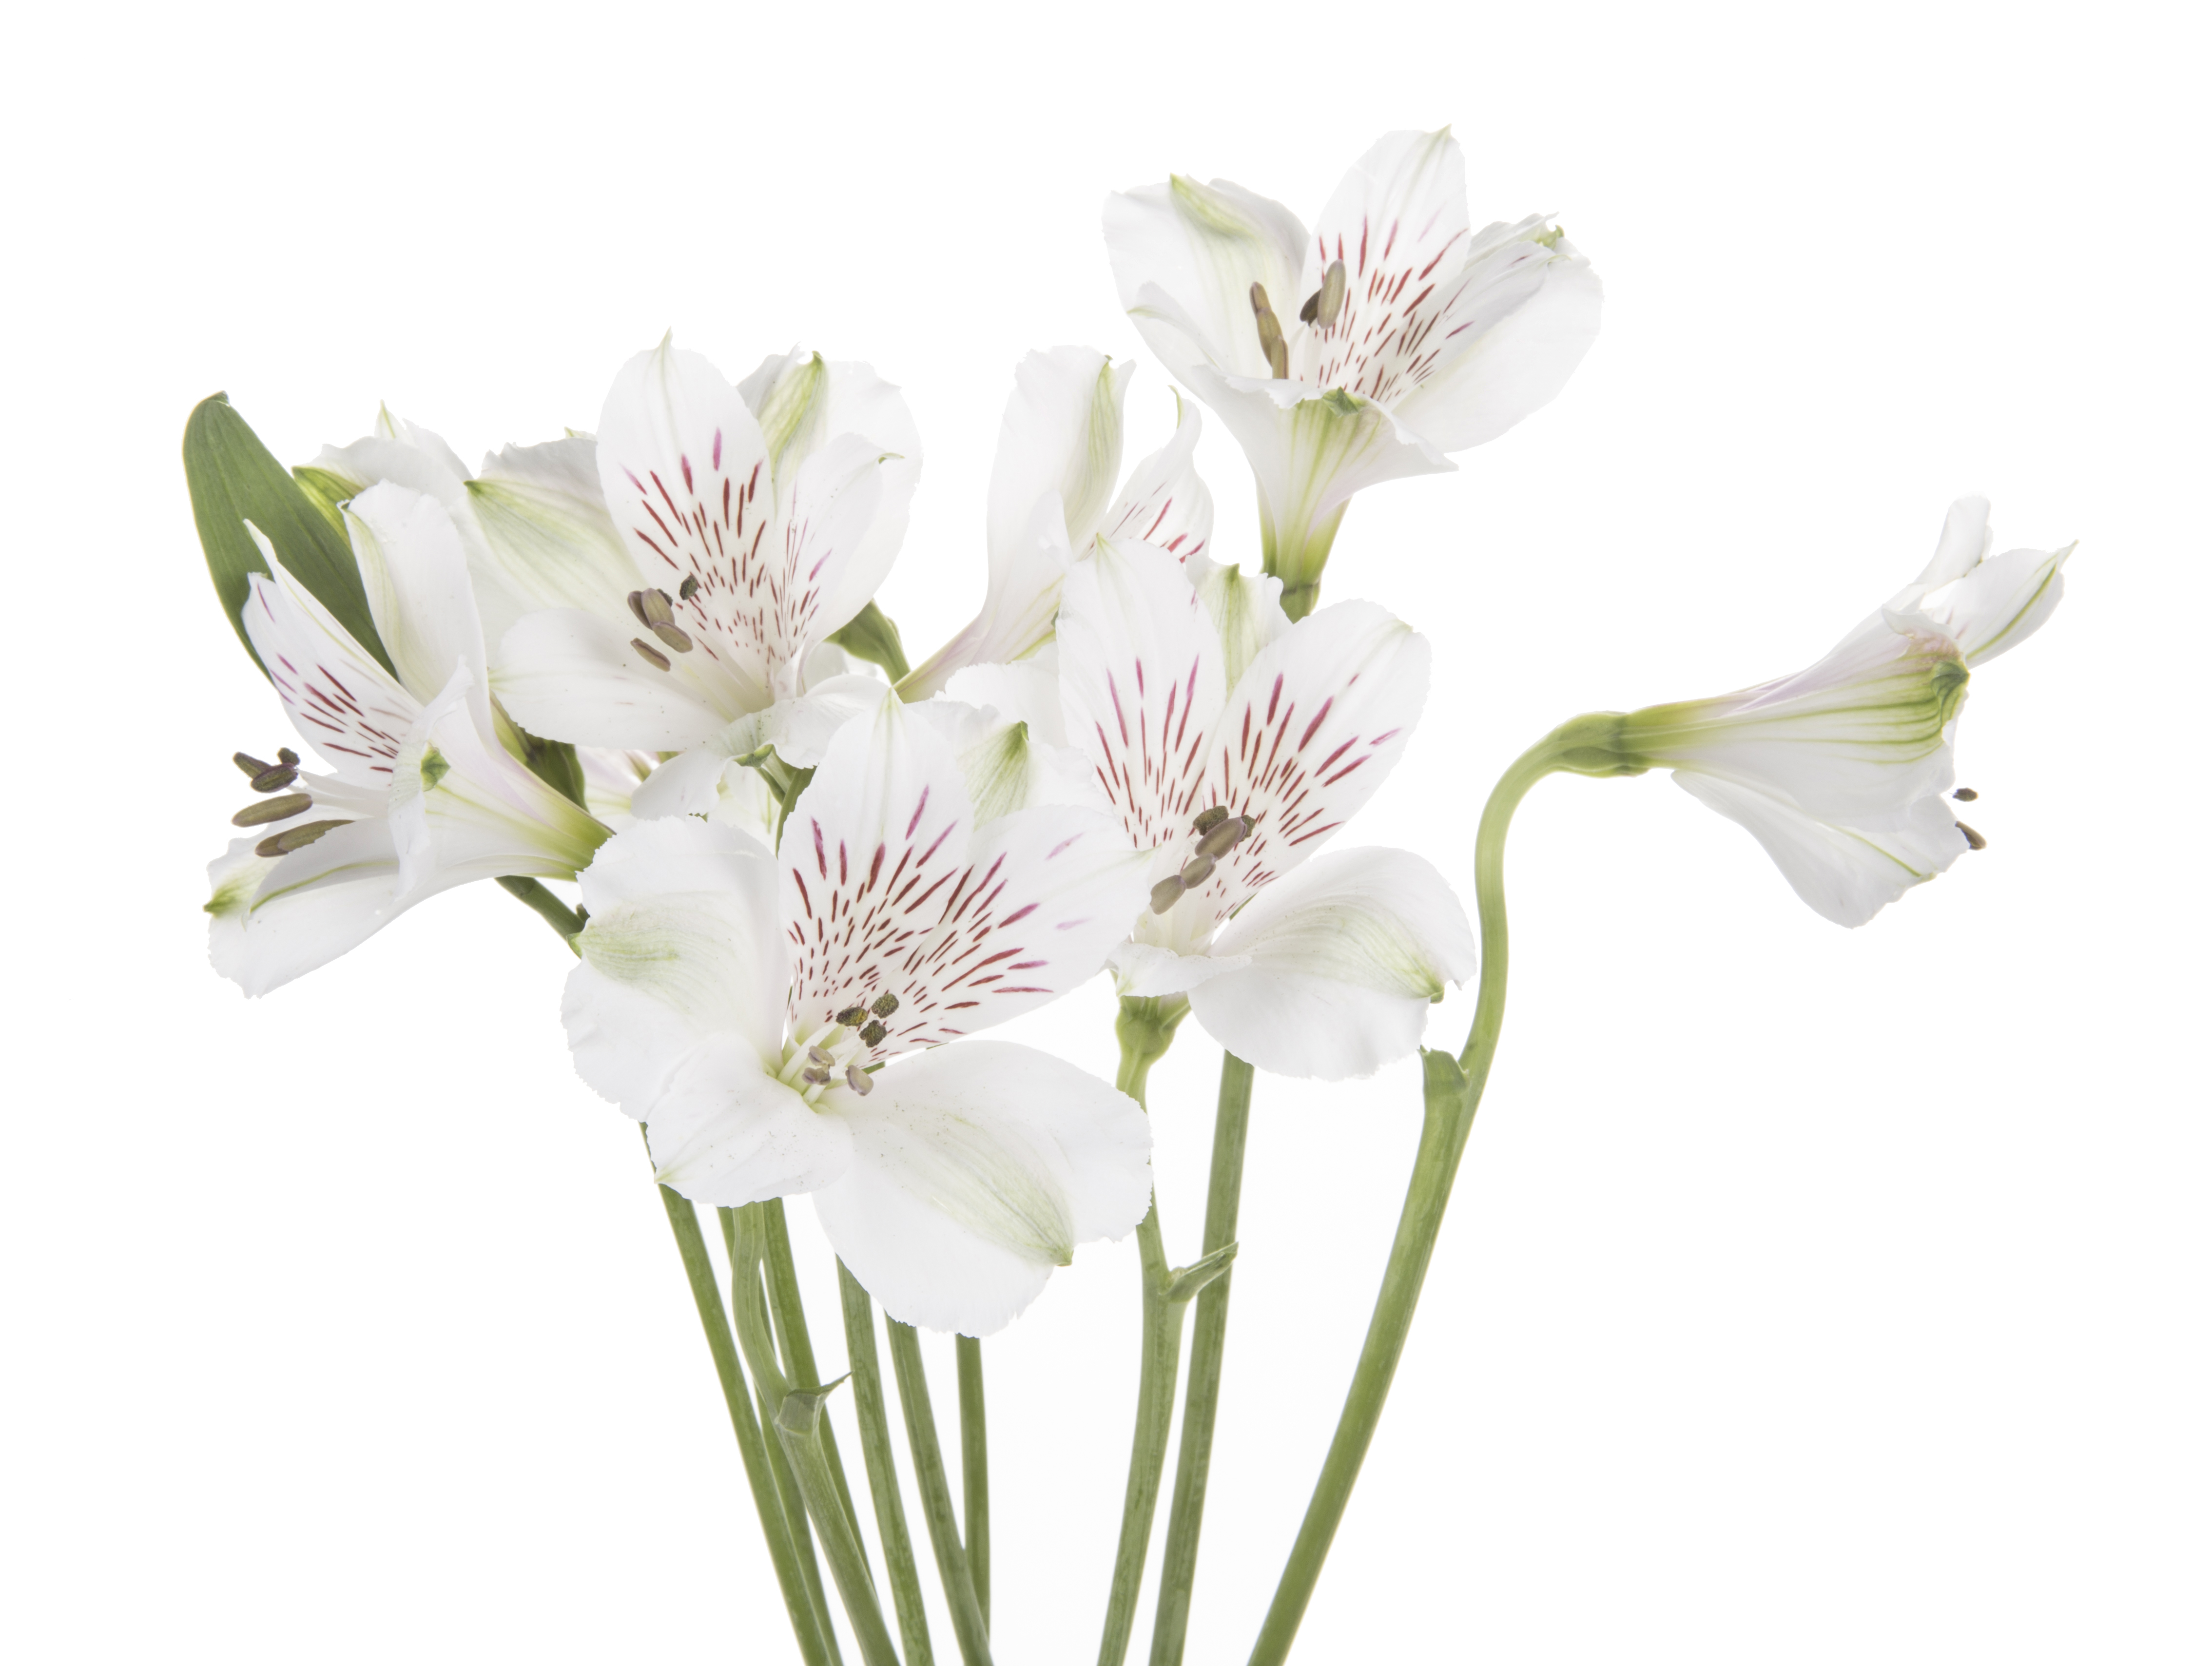 Alstroemeria - white